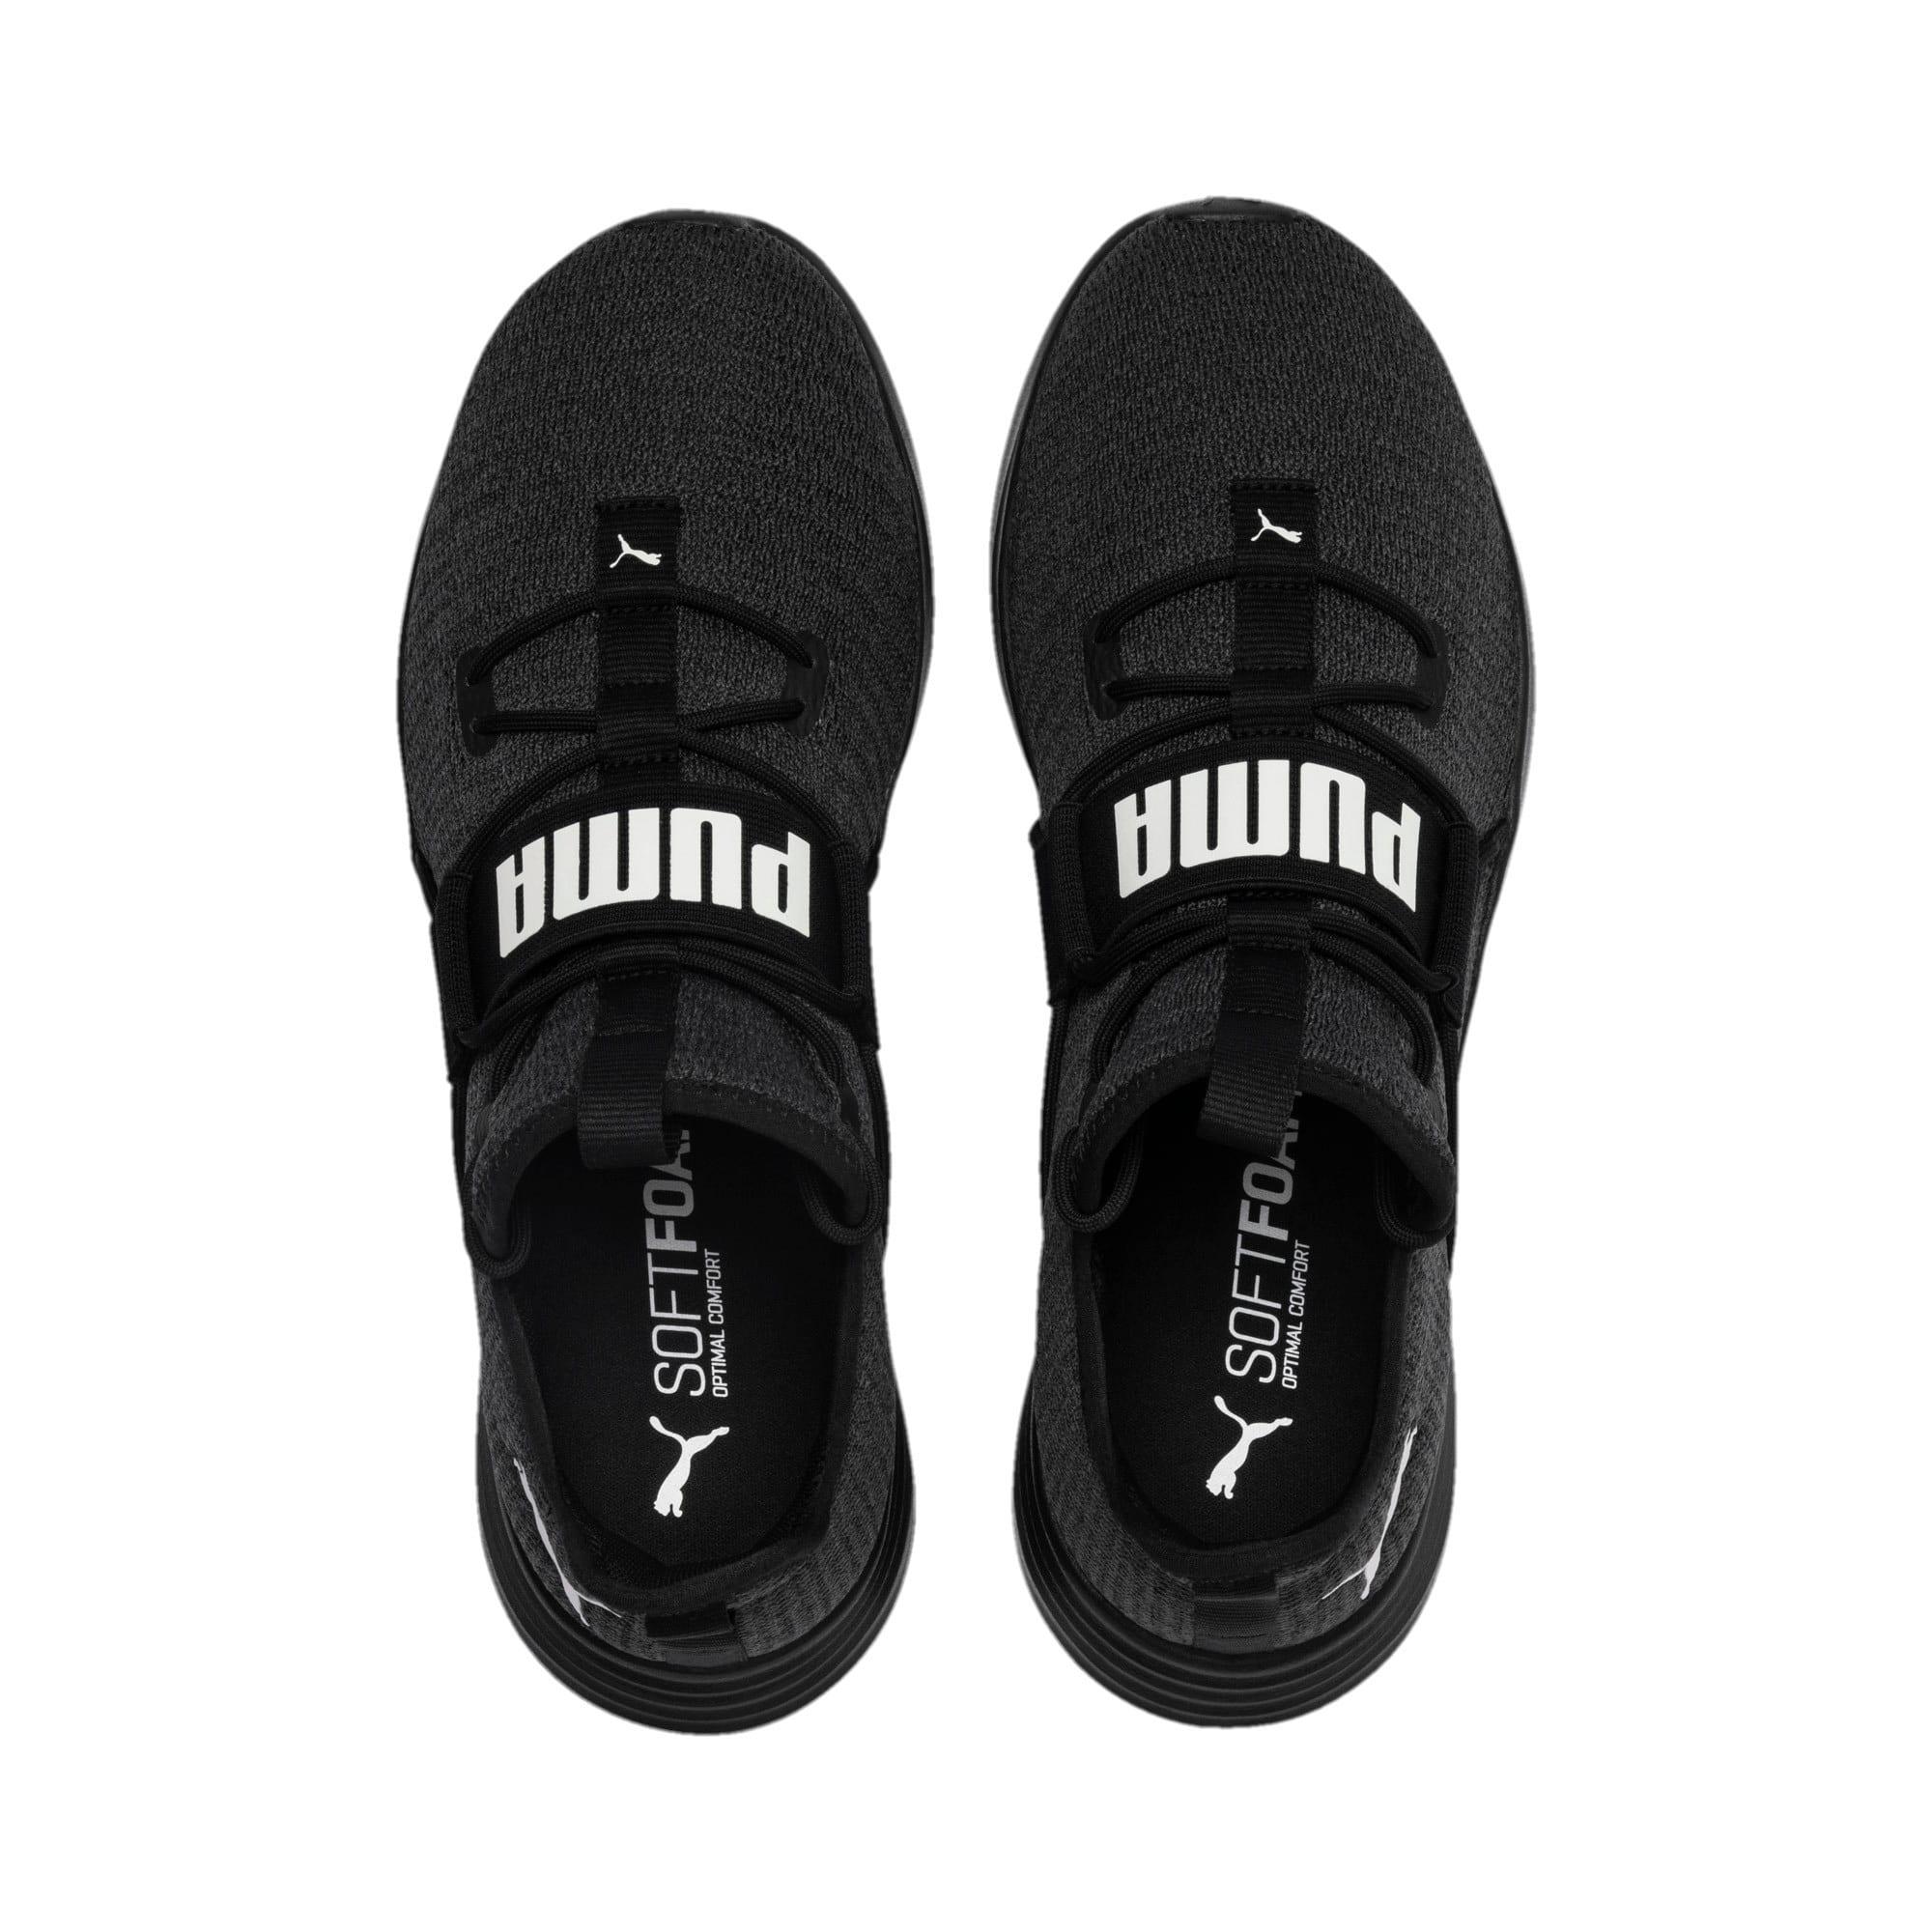 Thumbnail 6 of Persist XT Men's Training Shoes, Puma Black-Asphalt, medium